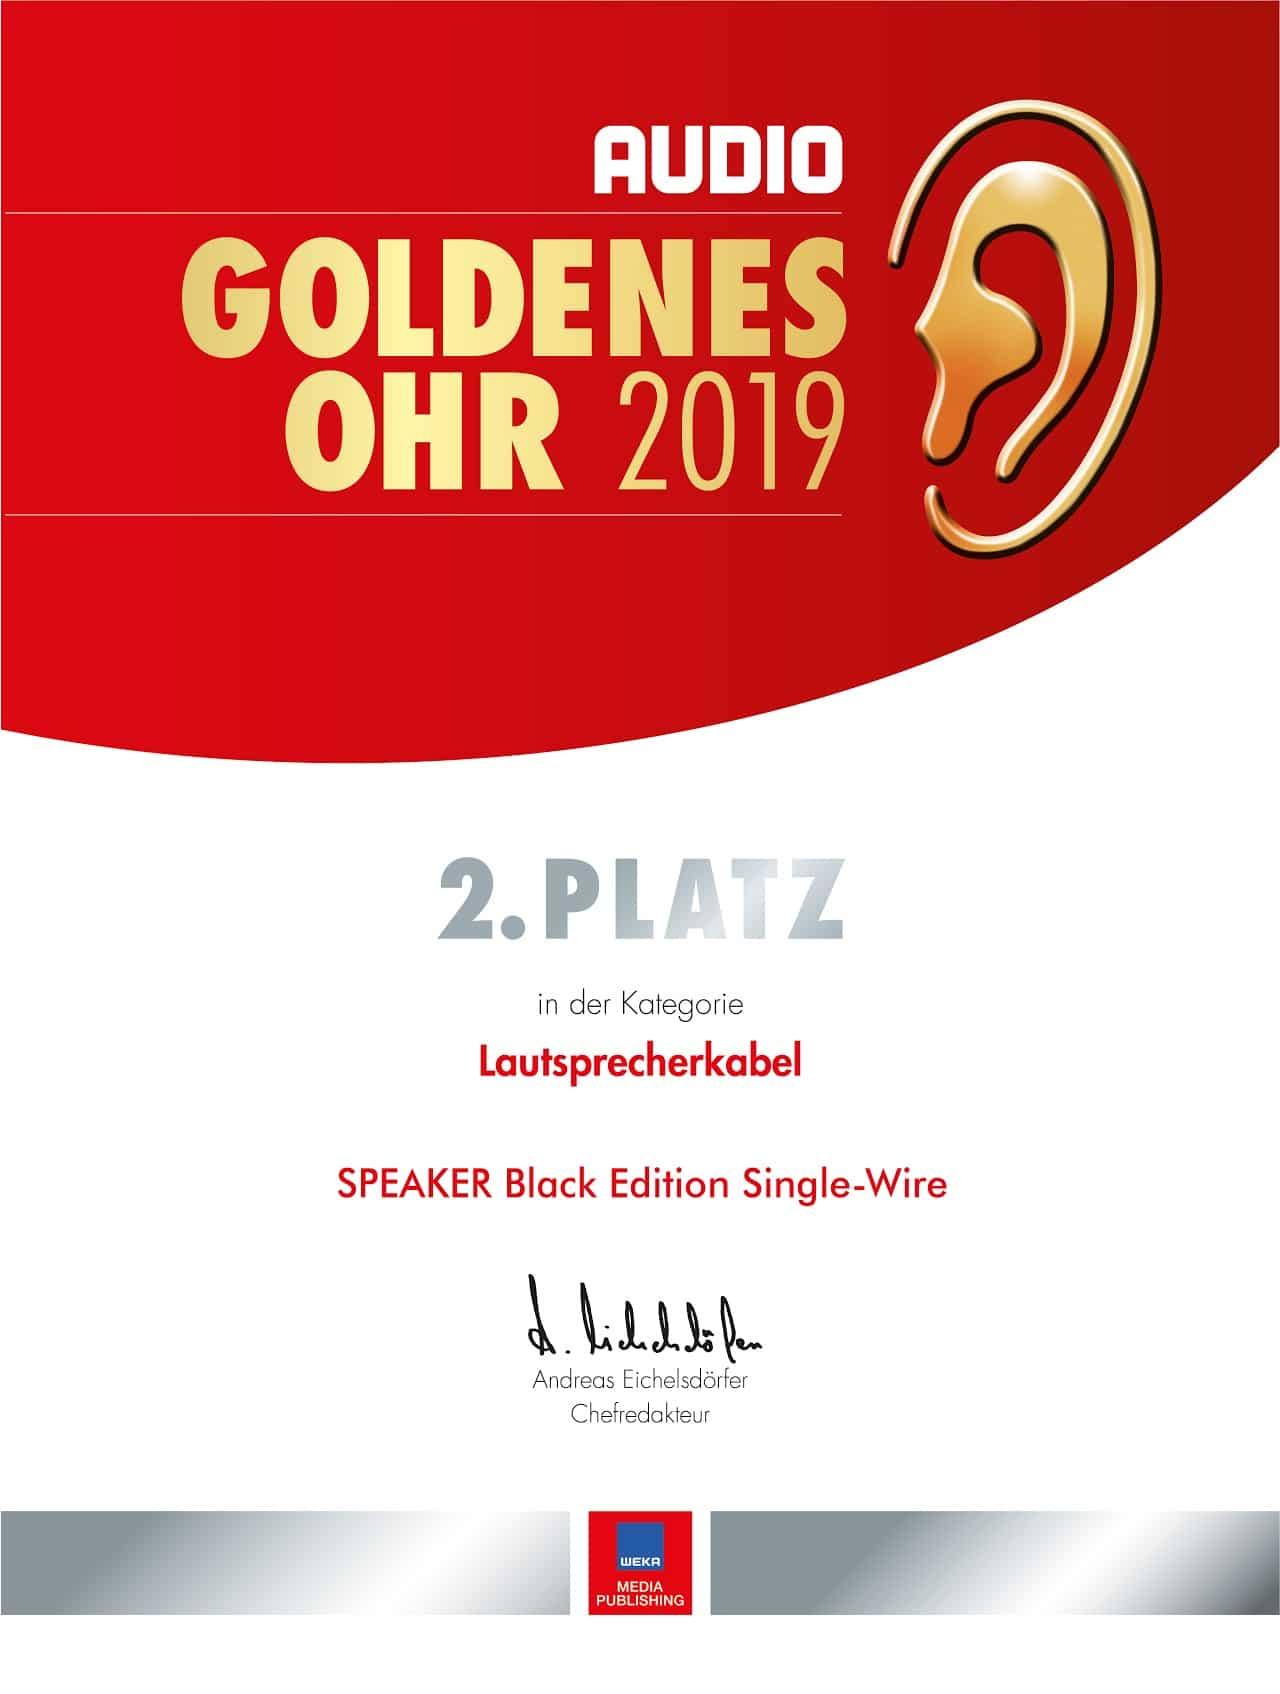 Goldenes Ohr 2019